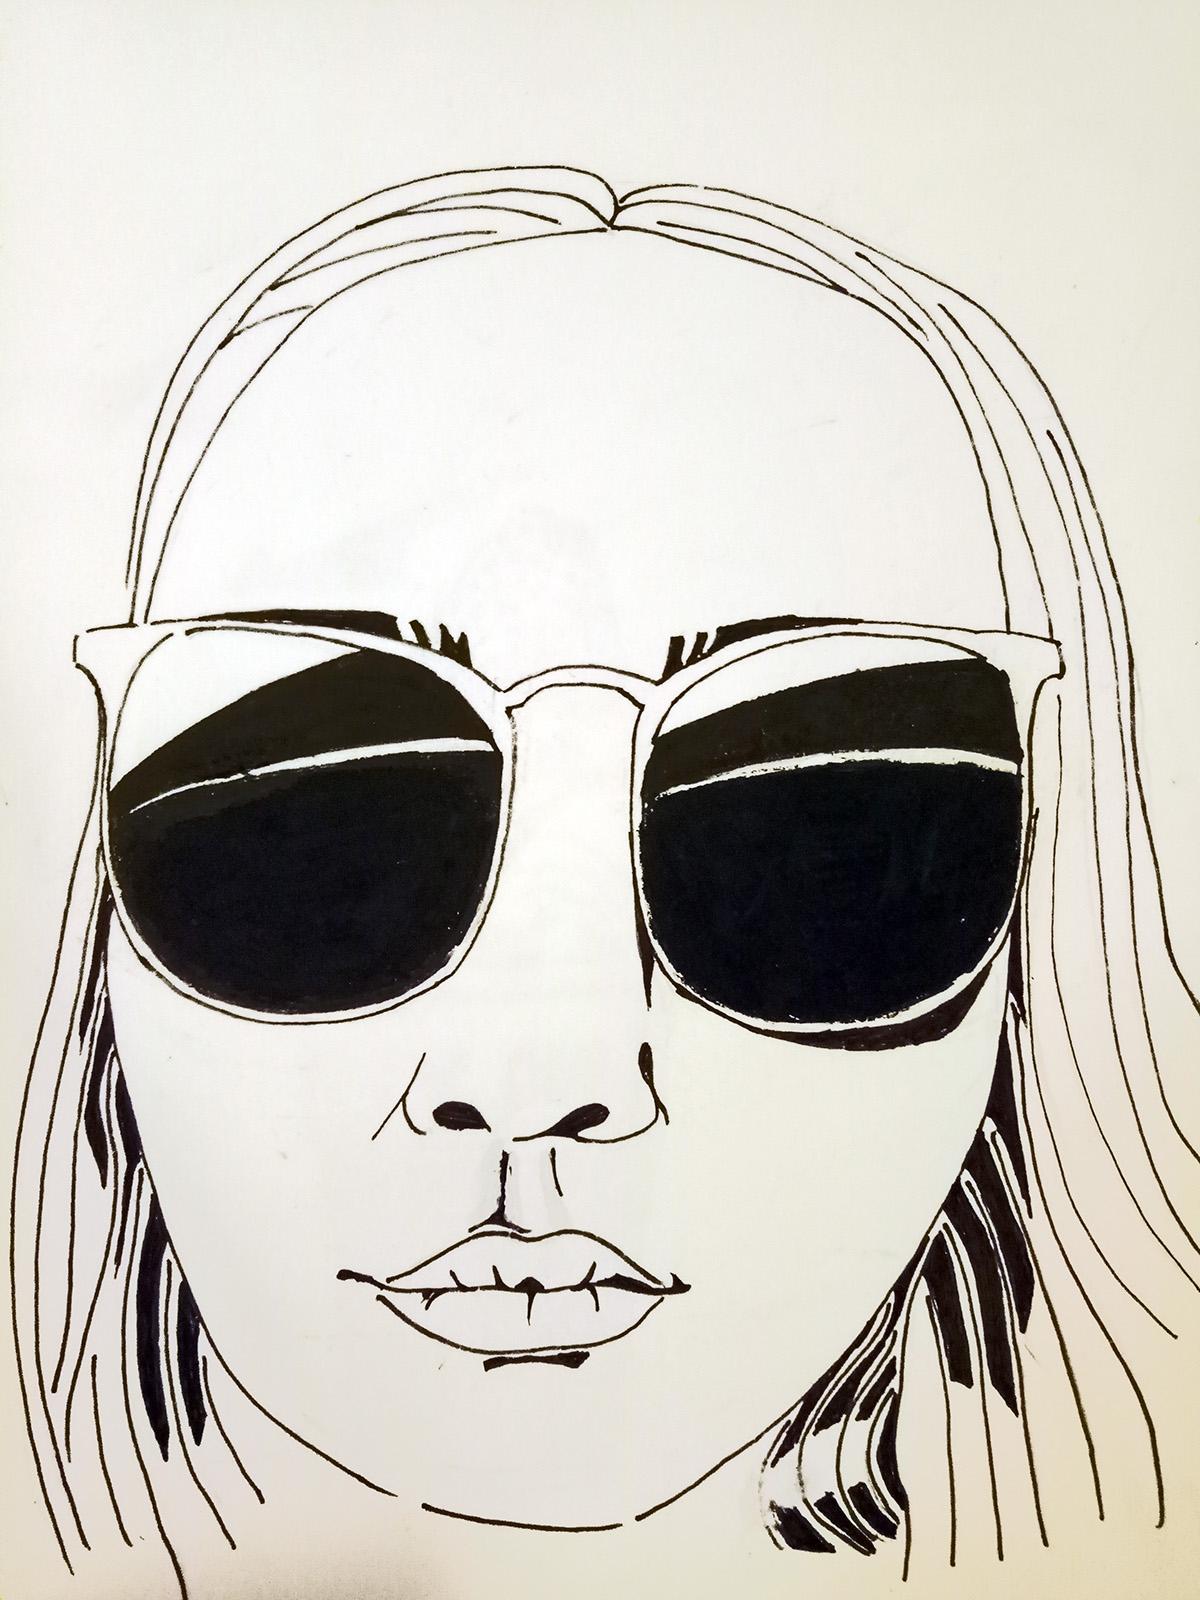 Illustrated Self Portrait Week 3